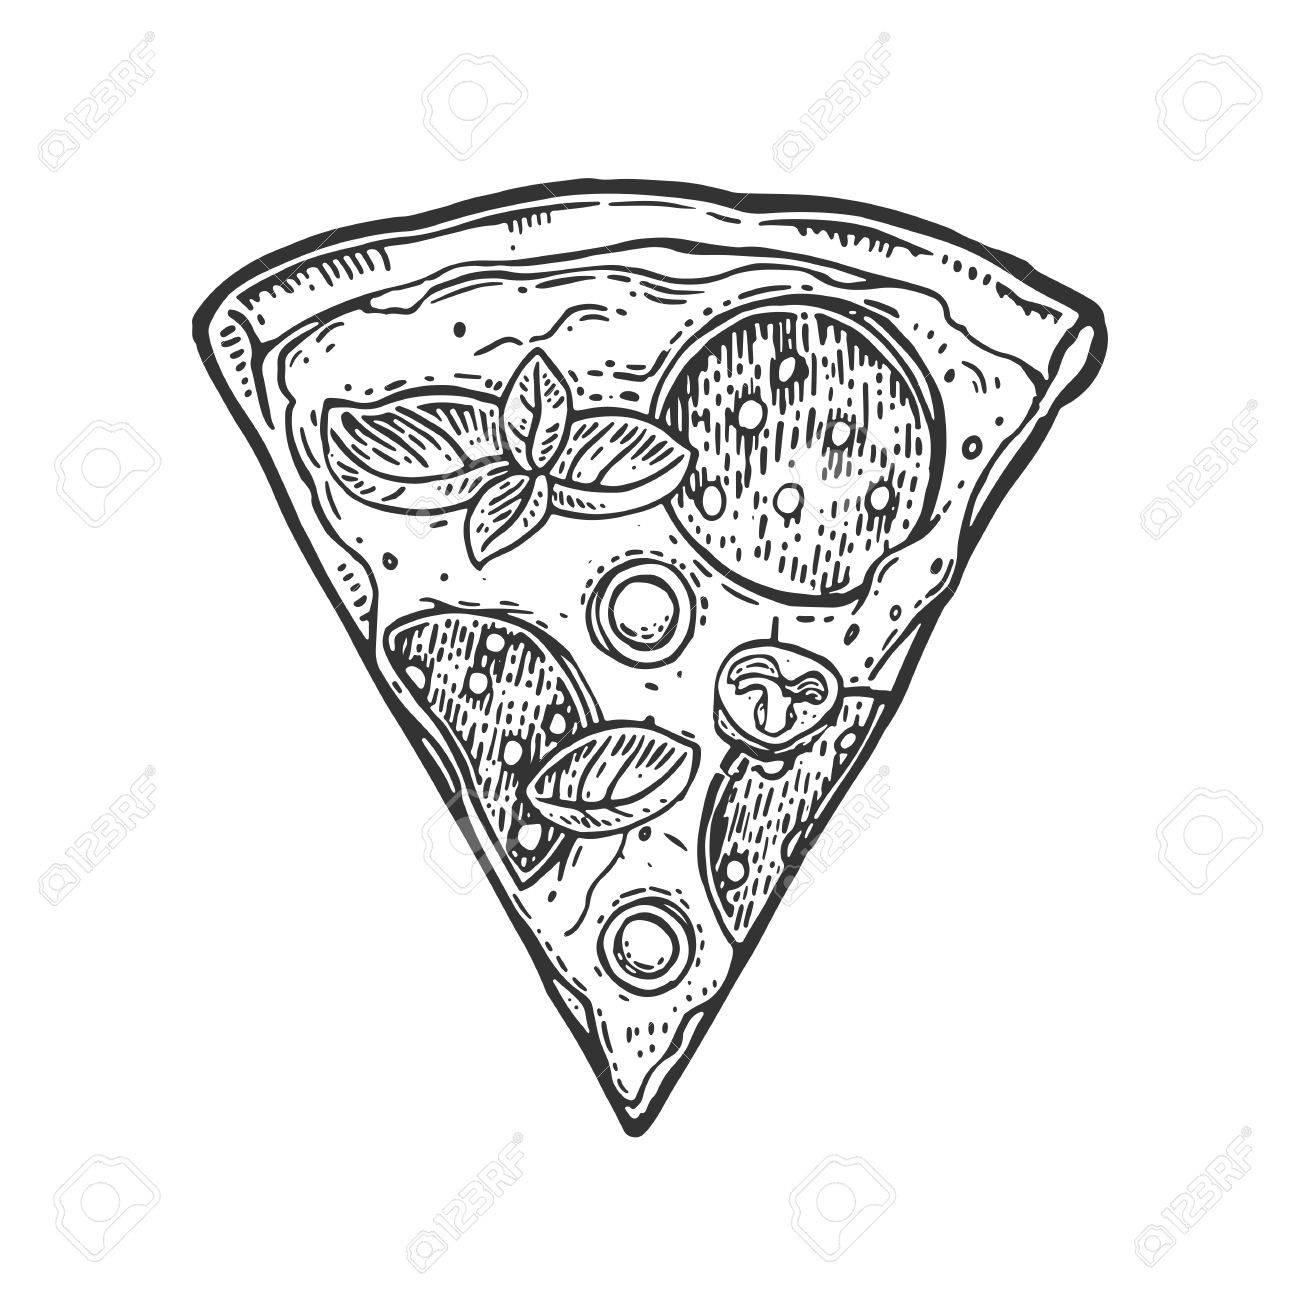 1300x1300 Slice Pizza Pepperoni. Vintage Vector Drawn Engraving Illustration